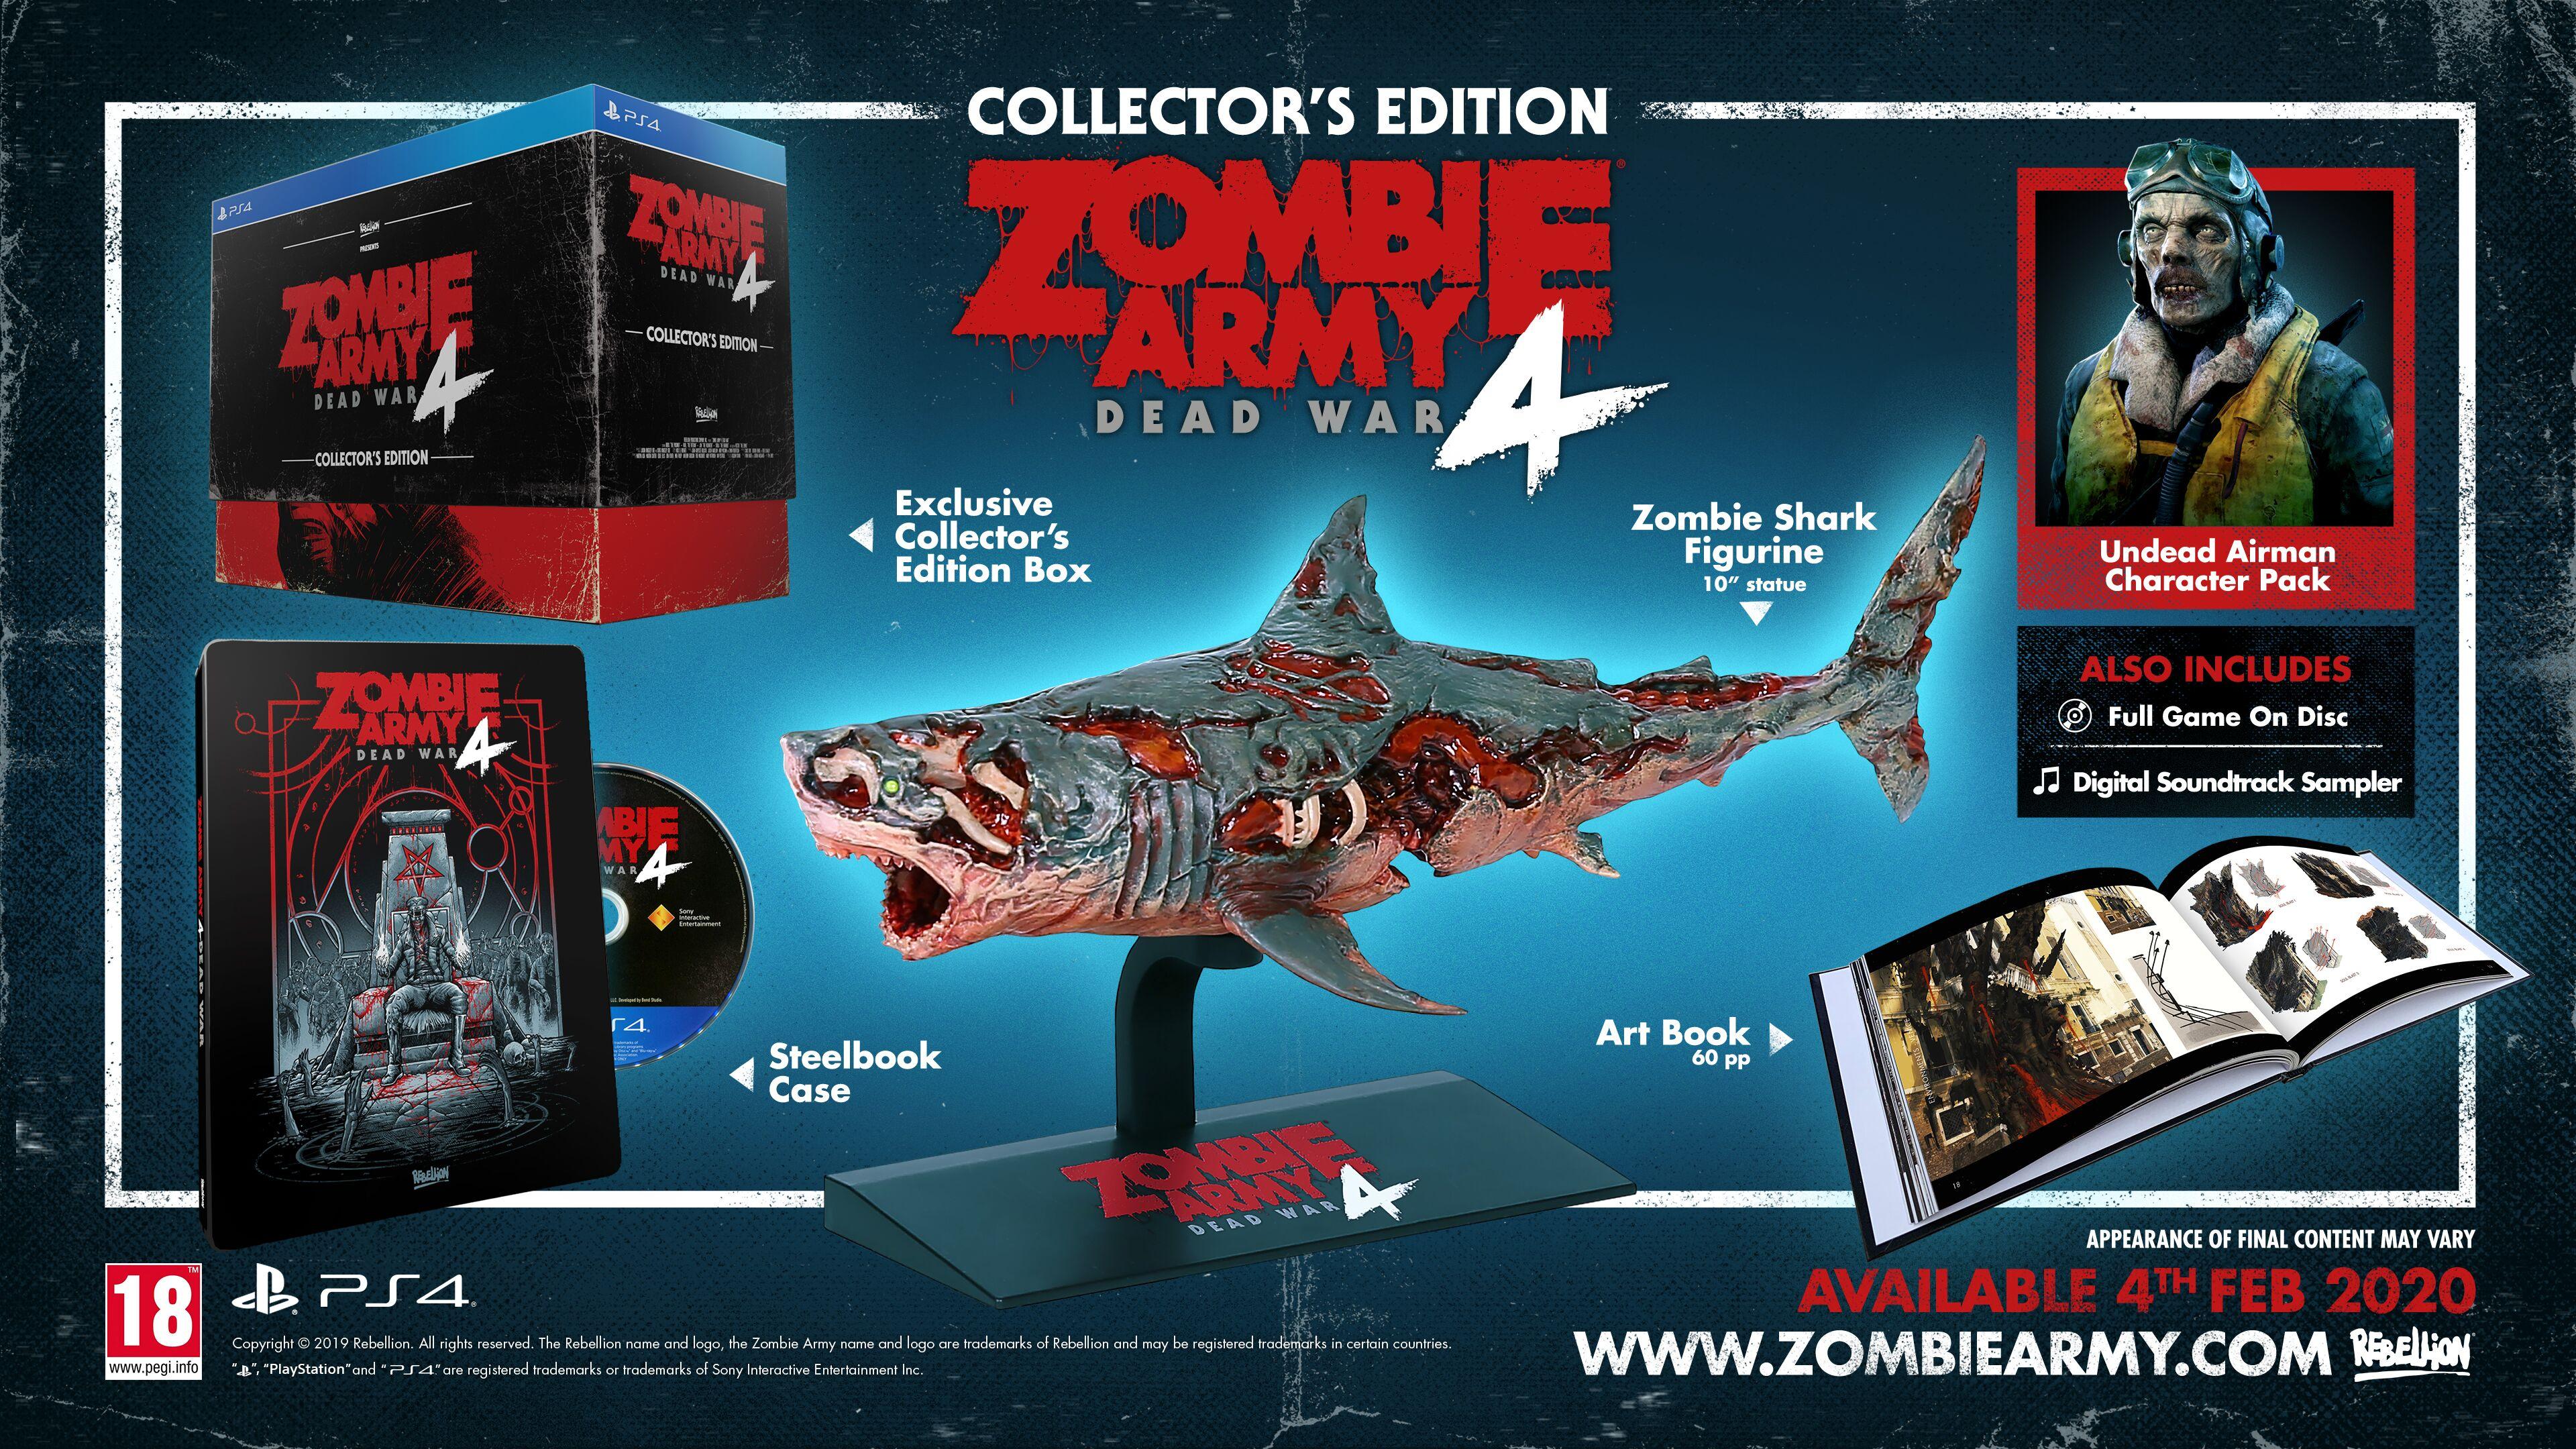 https://scale.coolshop-cdn.com/product-media.coolshop-cdn.com/AF3N84/ae8e90648f8d44d3937a19ae43258598.jpg/f/zombie-army-4-dead-war-collectors-edition.jpg